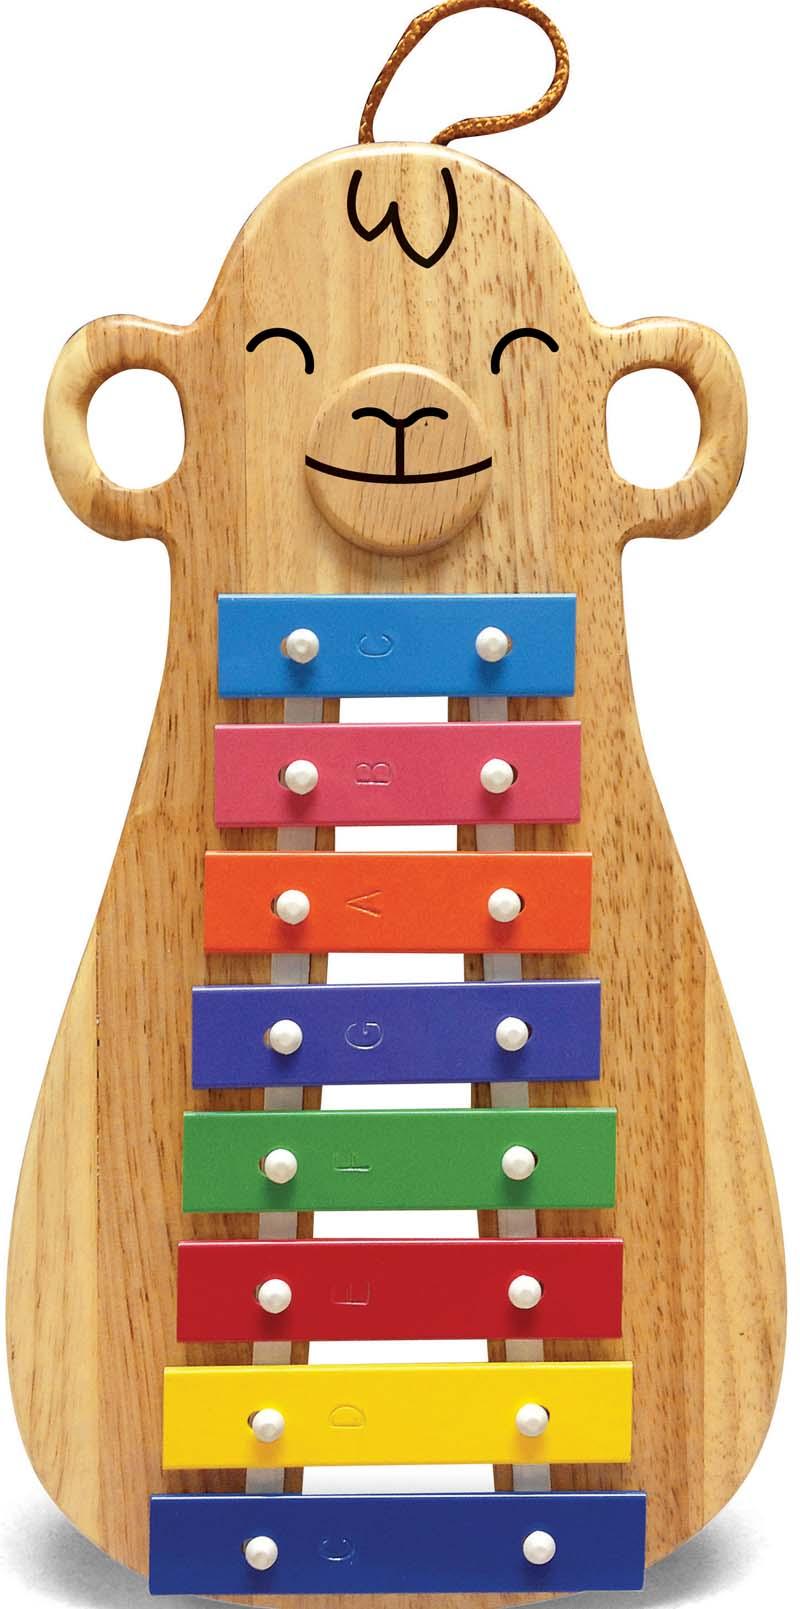 KHS America Recalls Children's Musical Instrument Due to Violation of Lead Paint Standard